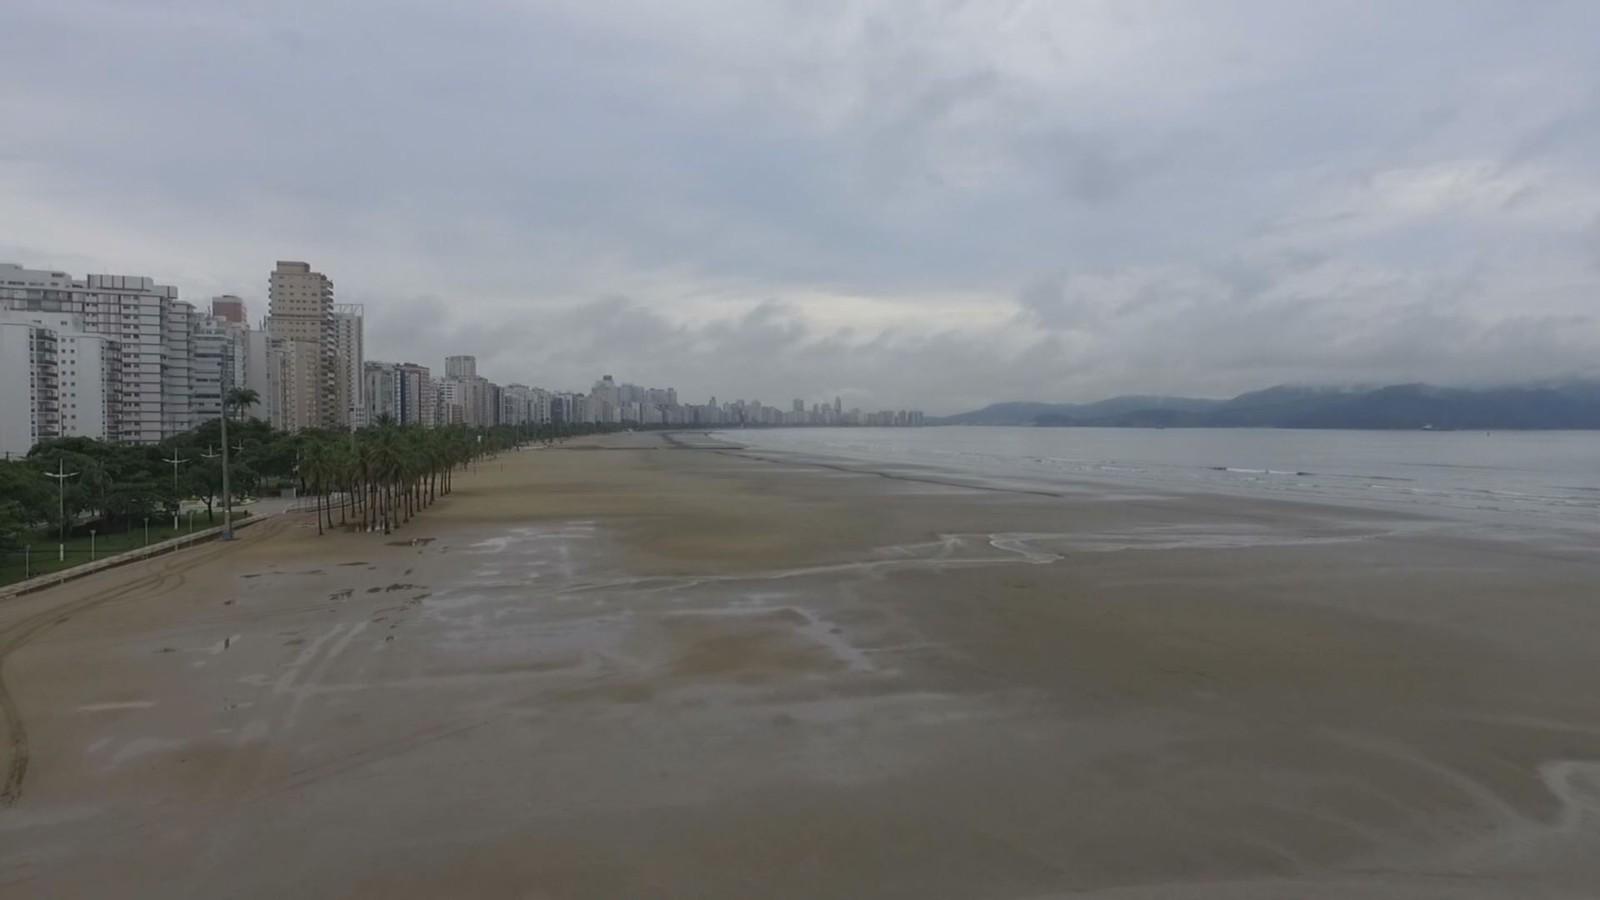 Corona esvaziam praias de Santos